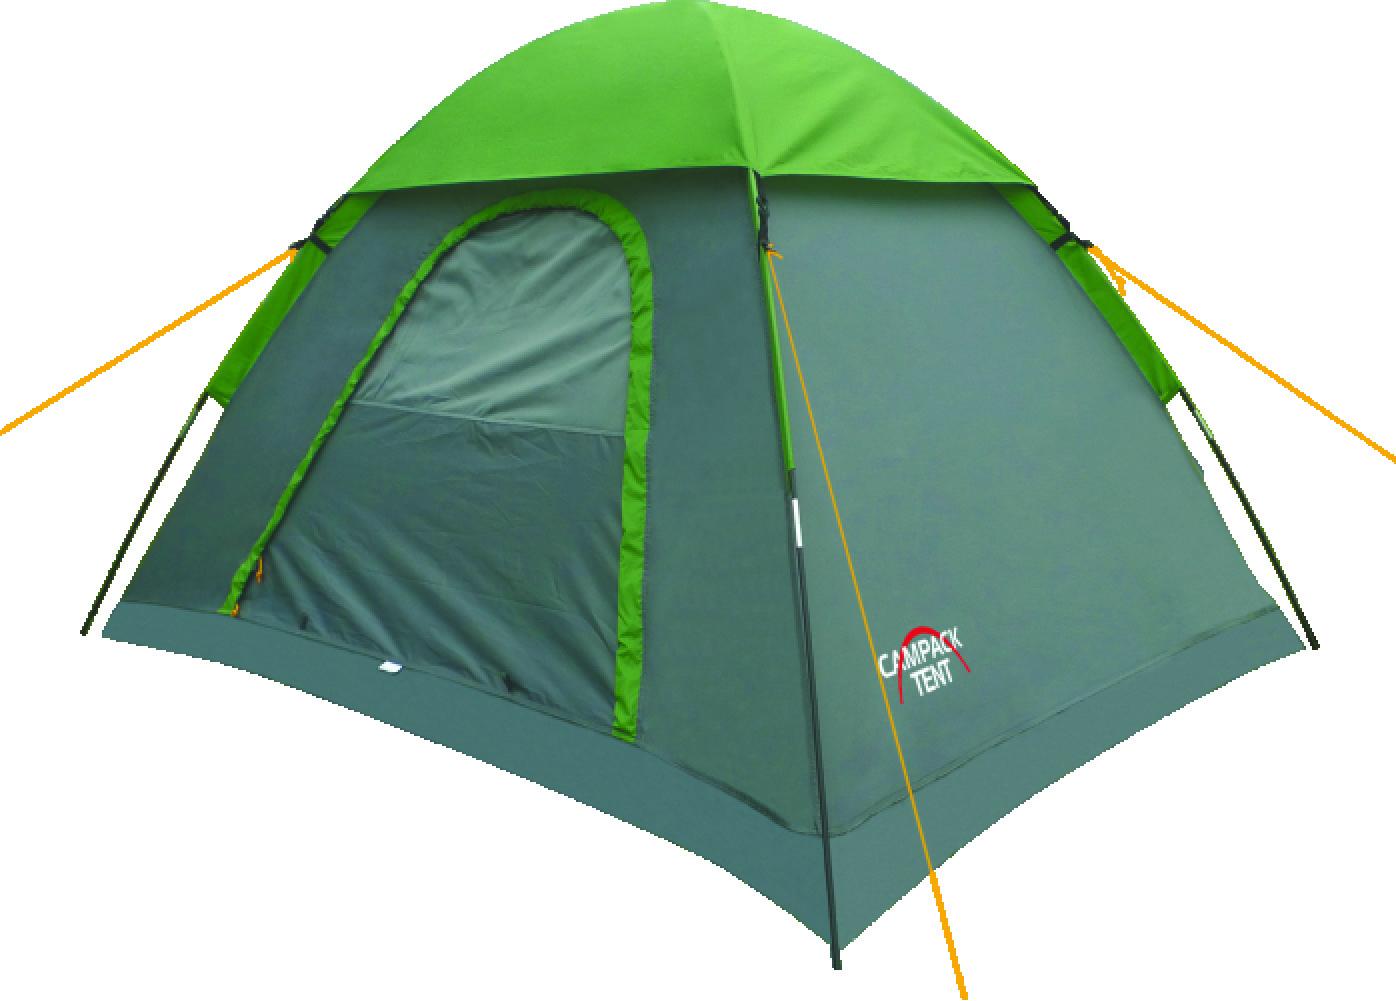 Палатка туристическая CAMPACK-TENT Free Explorer 2 палатка трехместная campack tent breeze explorer 3